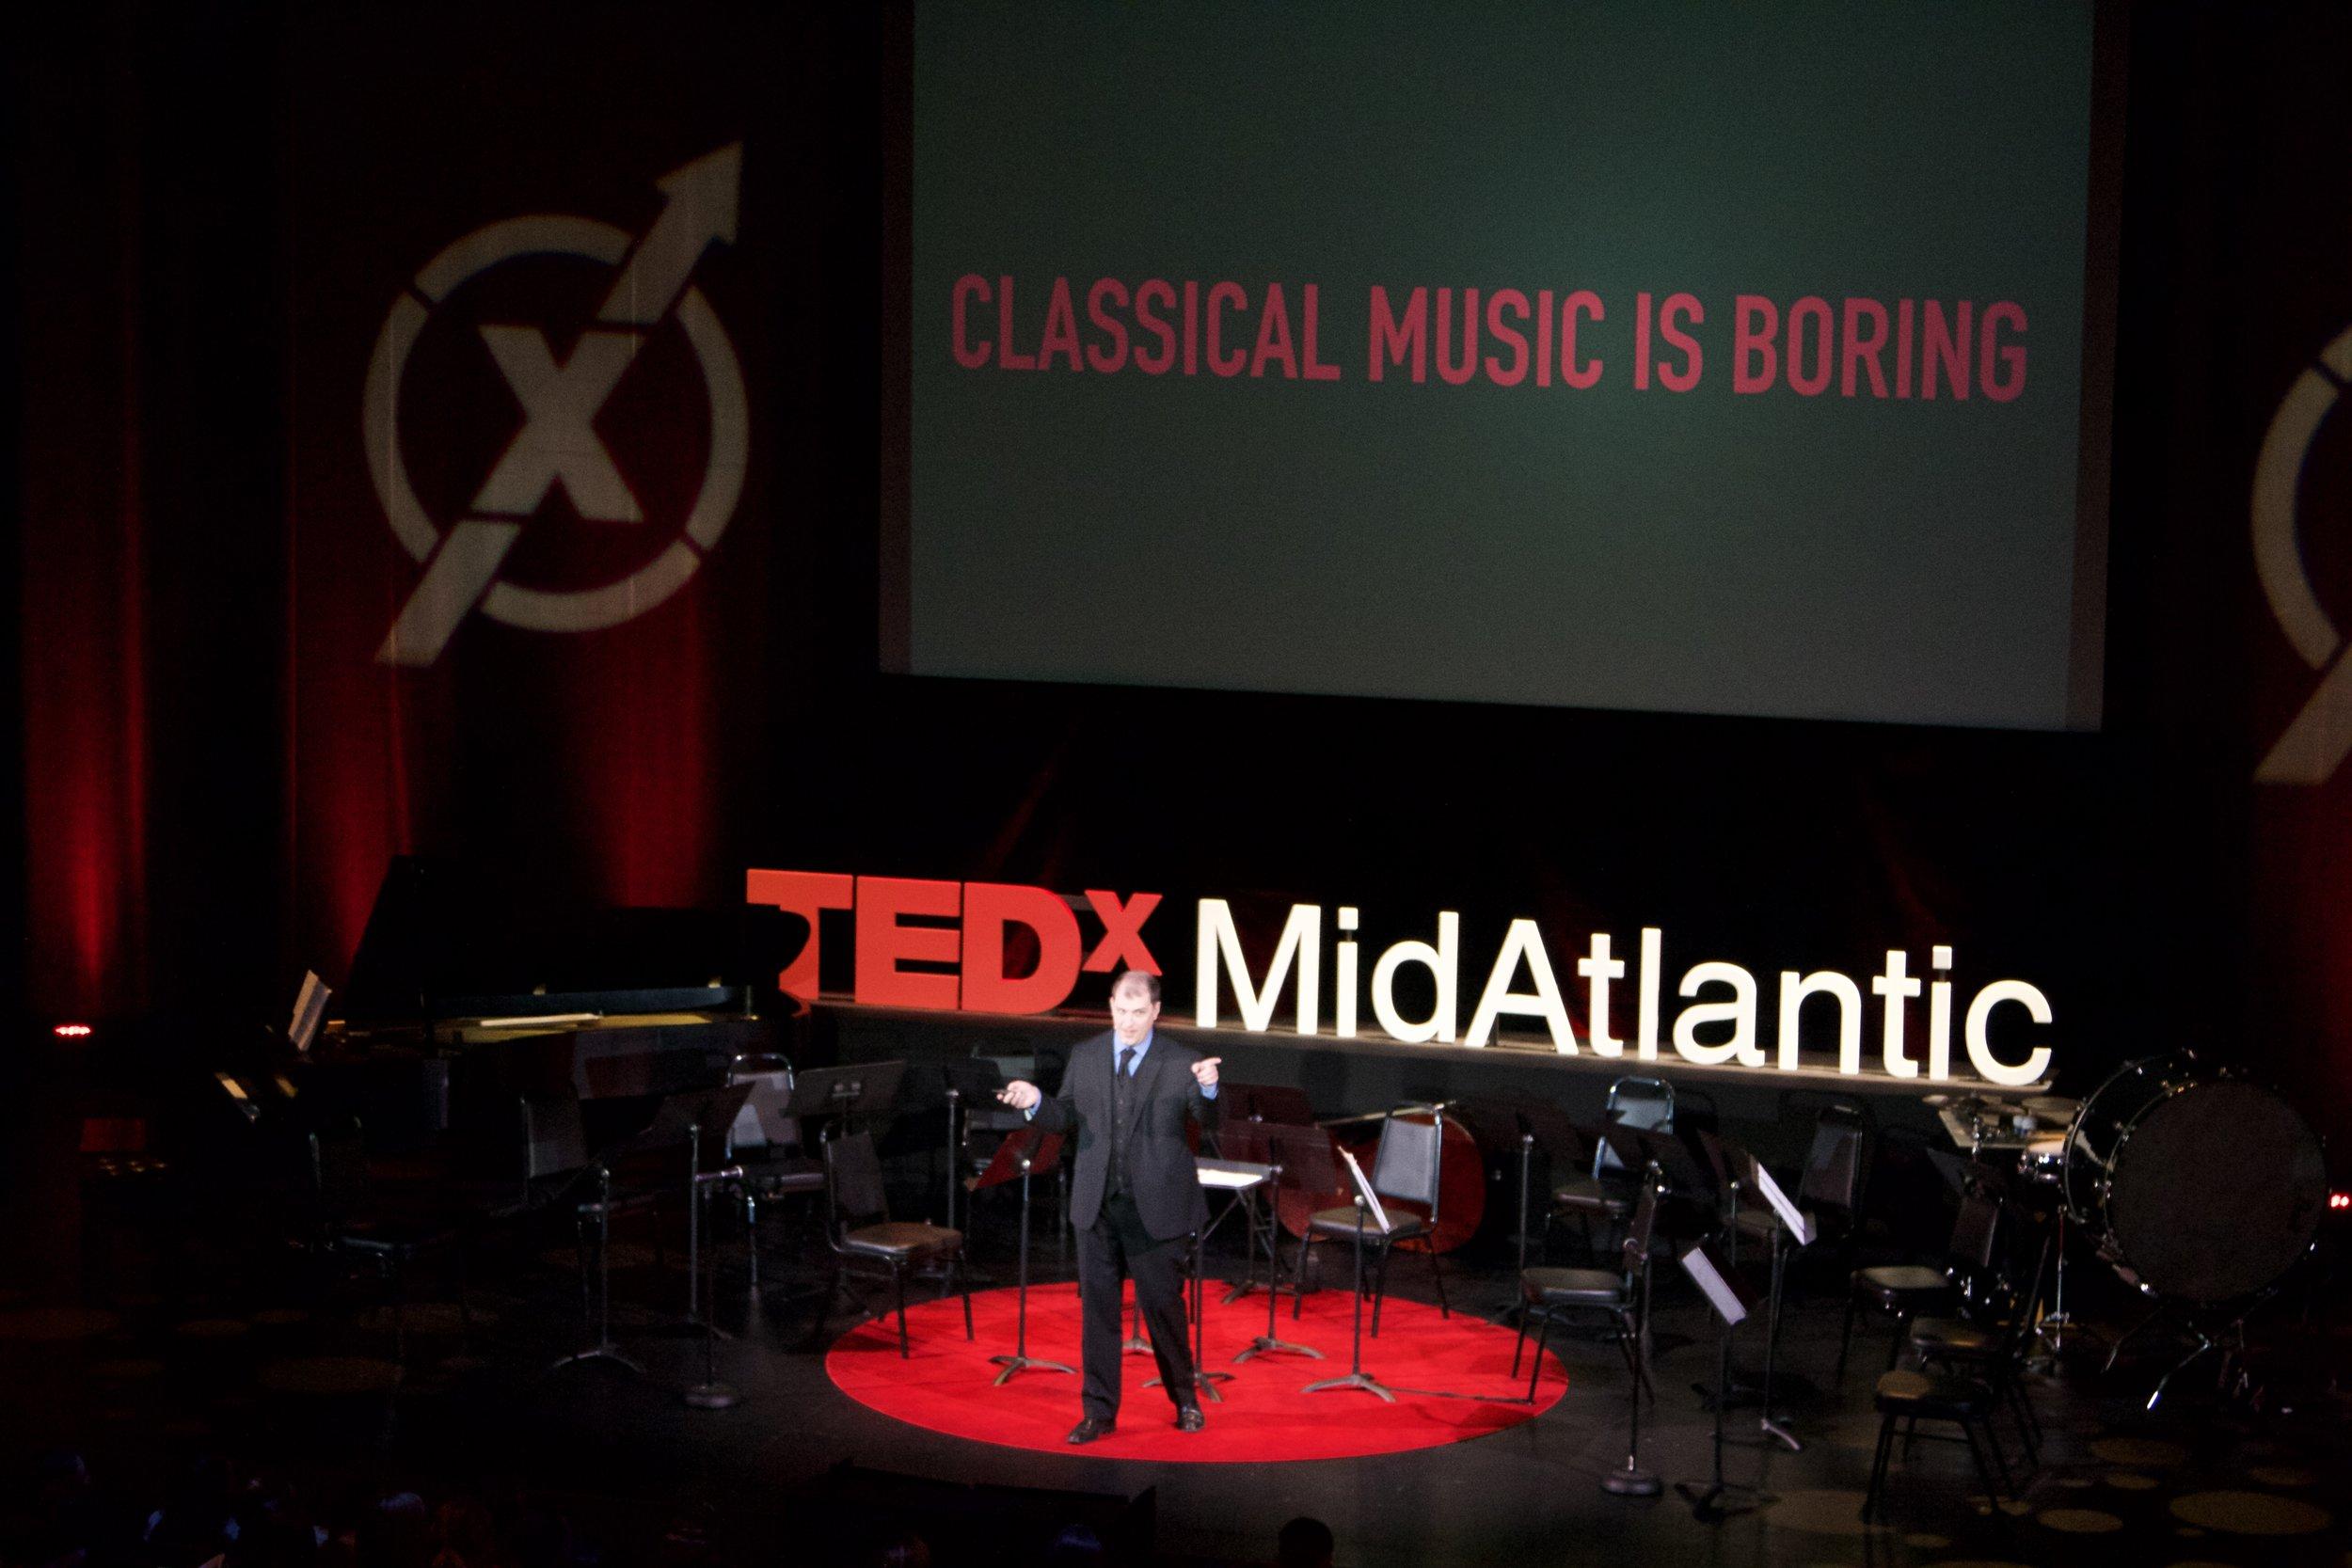 Jordan Randall Smith speaks at TEDxMidAtlantic 2017 in Washington, D.C.